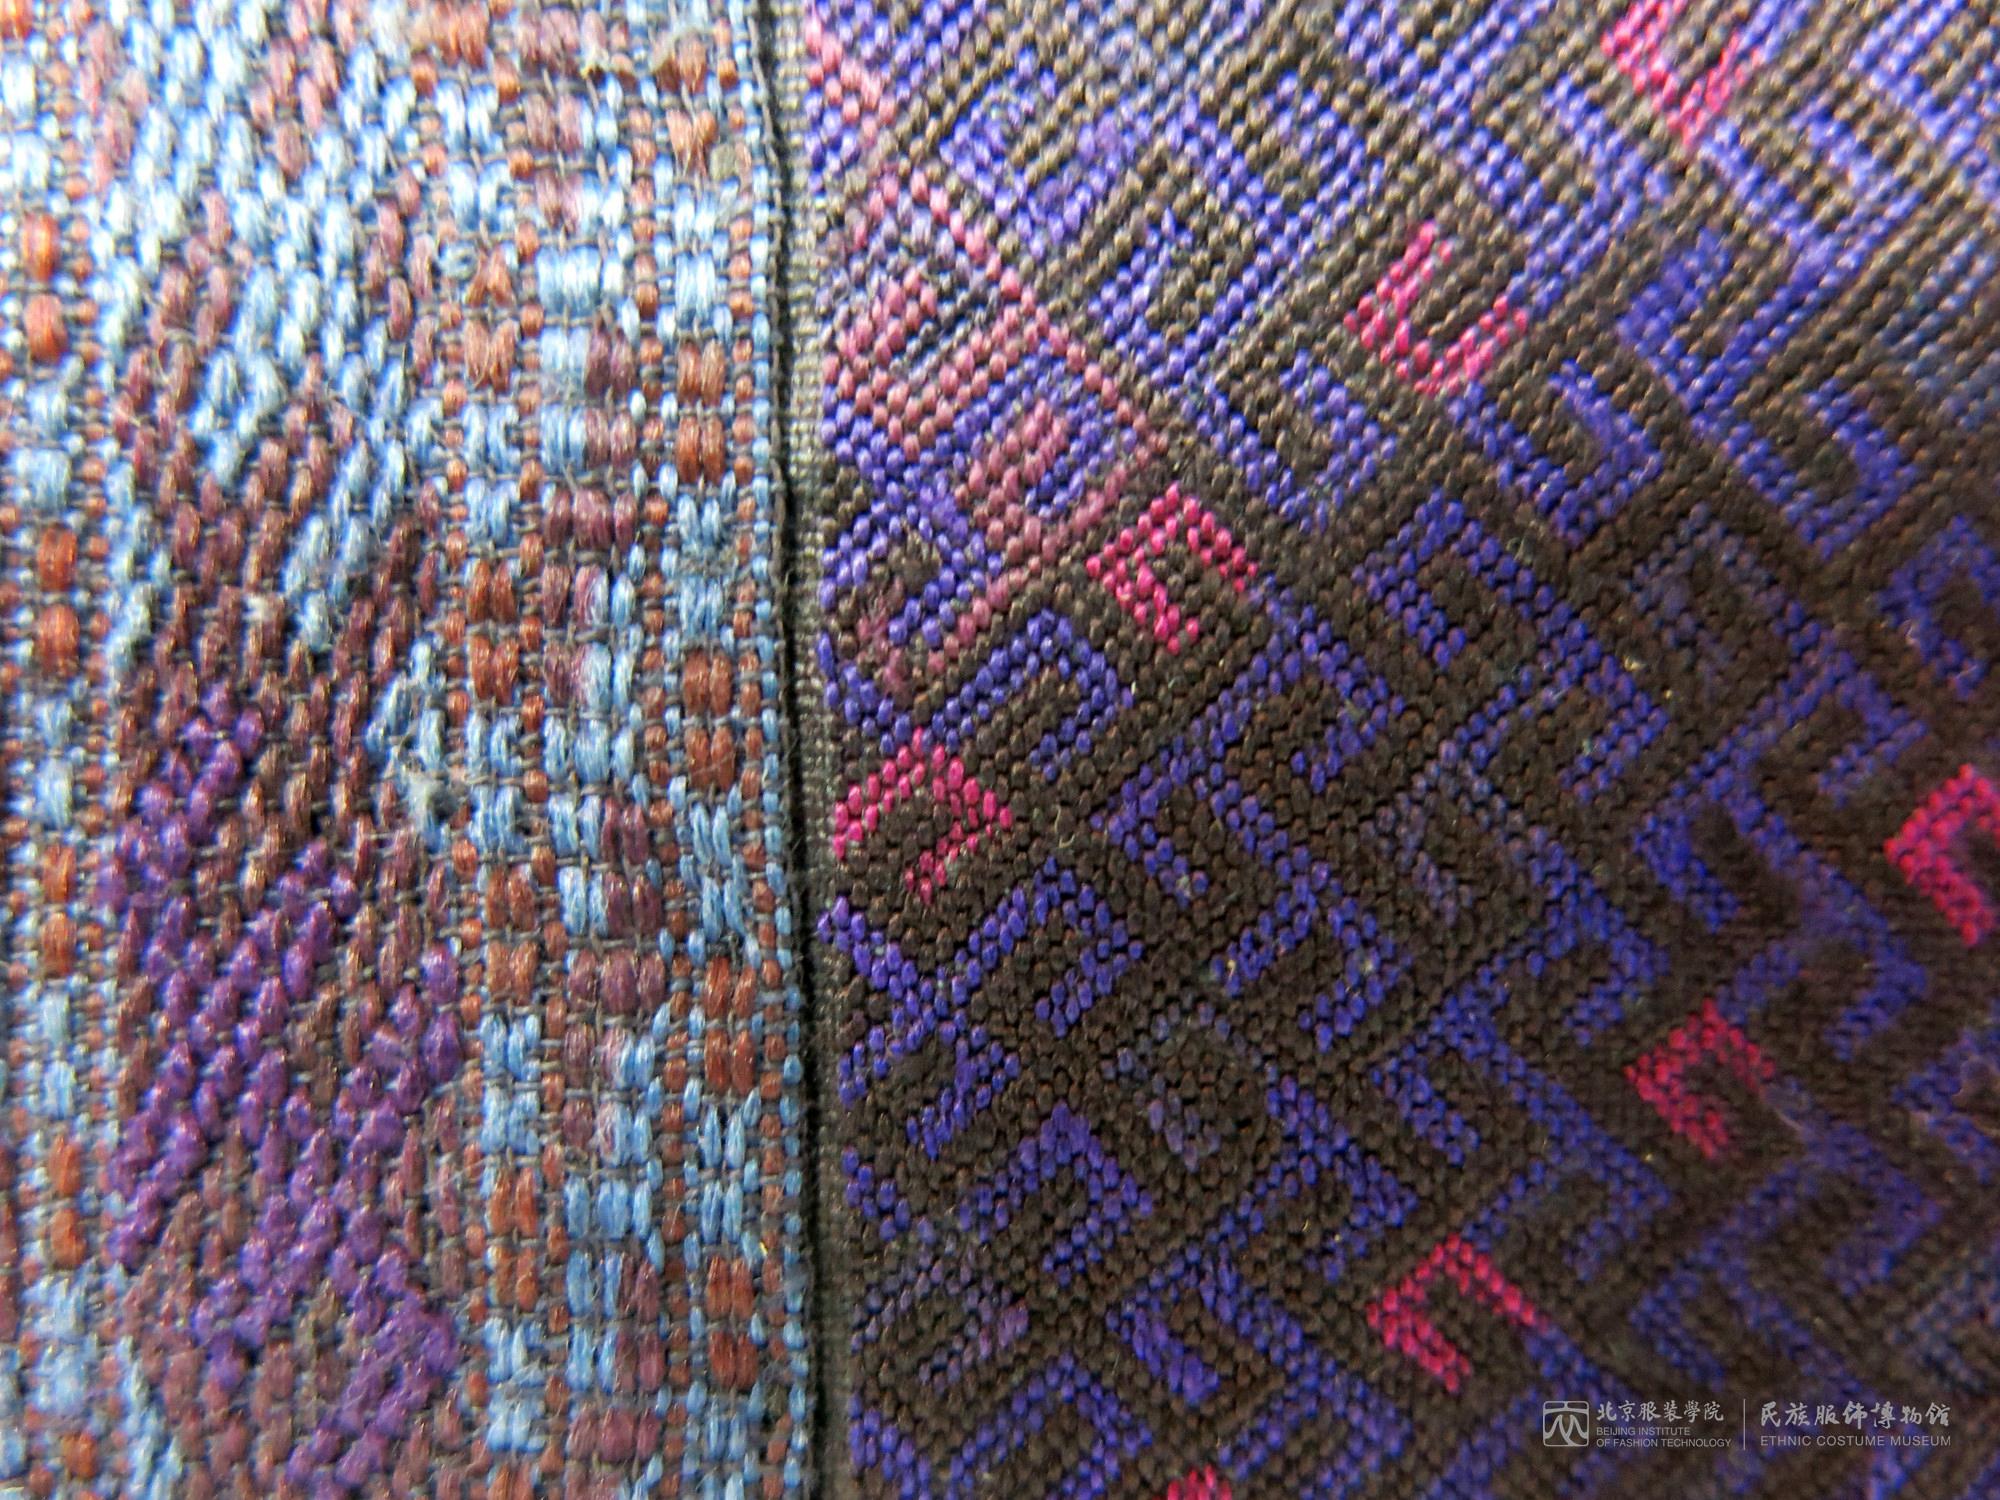 Left side: Brocade; right side: Darning stitch